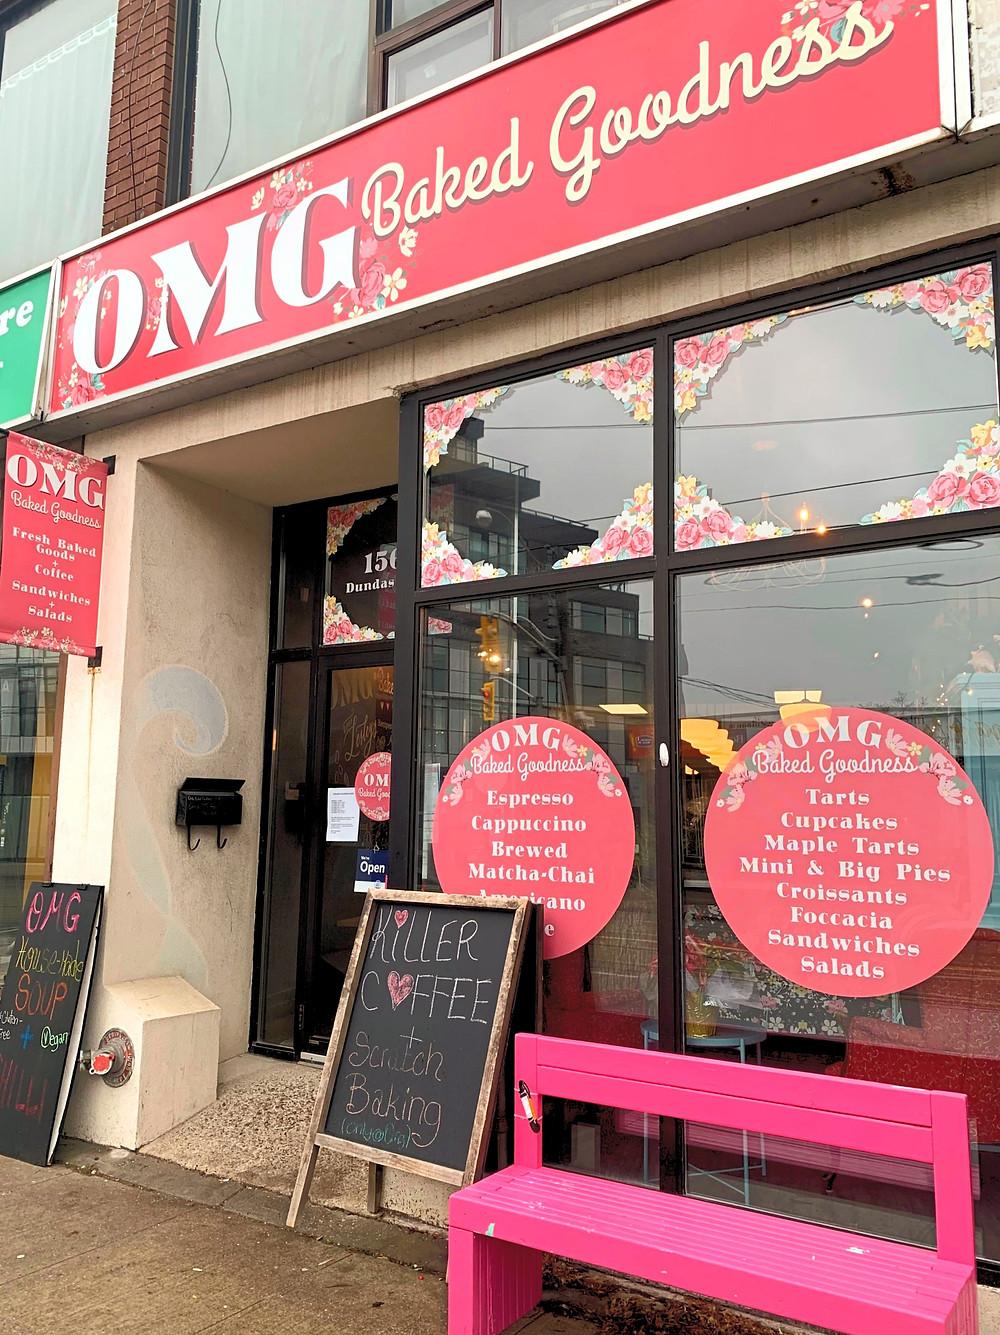 OMG Baked Goodness 1561 Dundas St W bakery and cafe